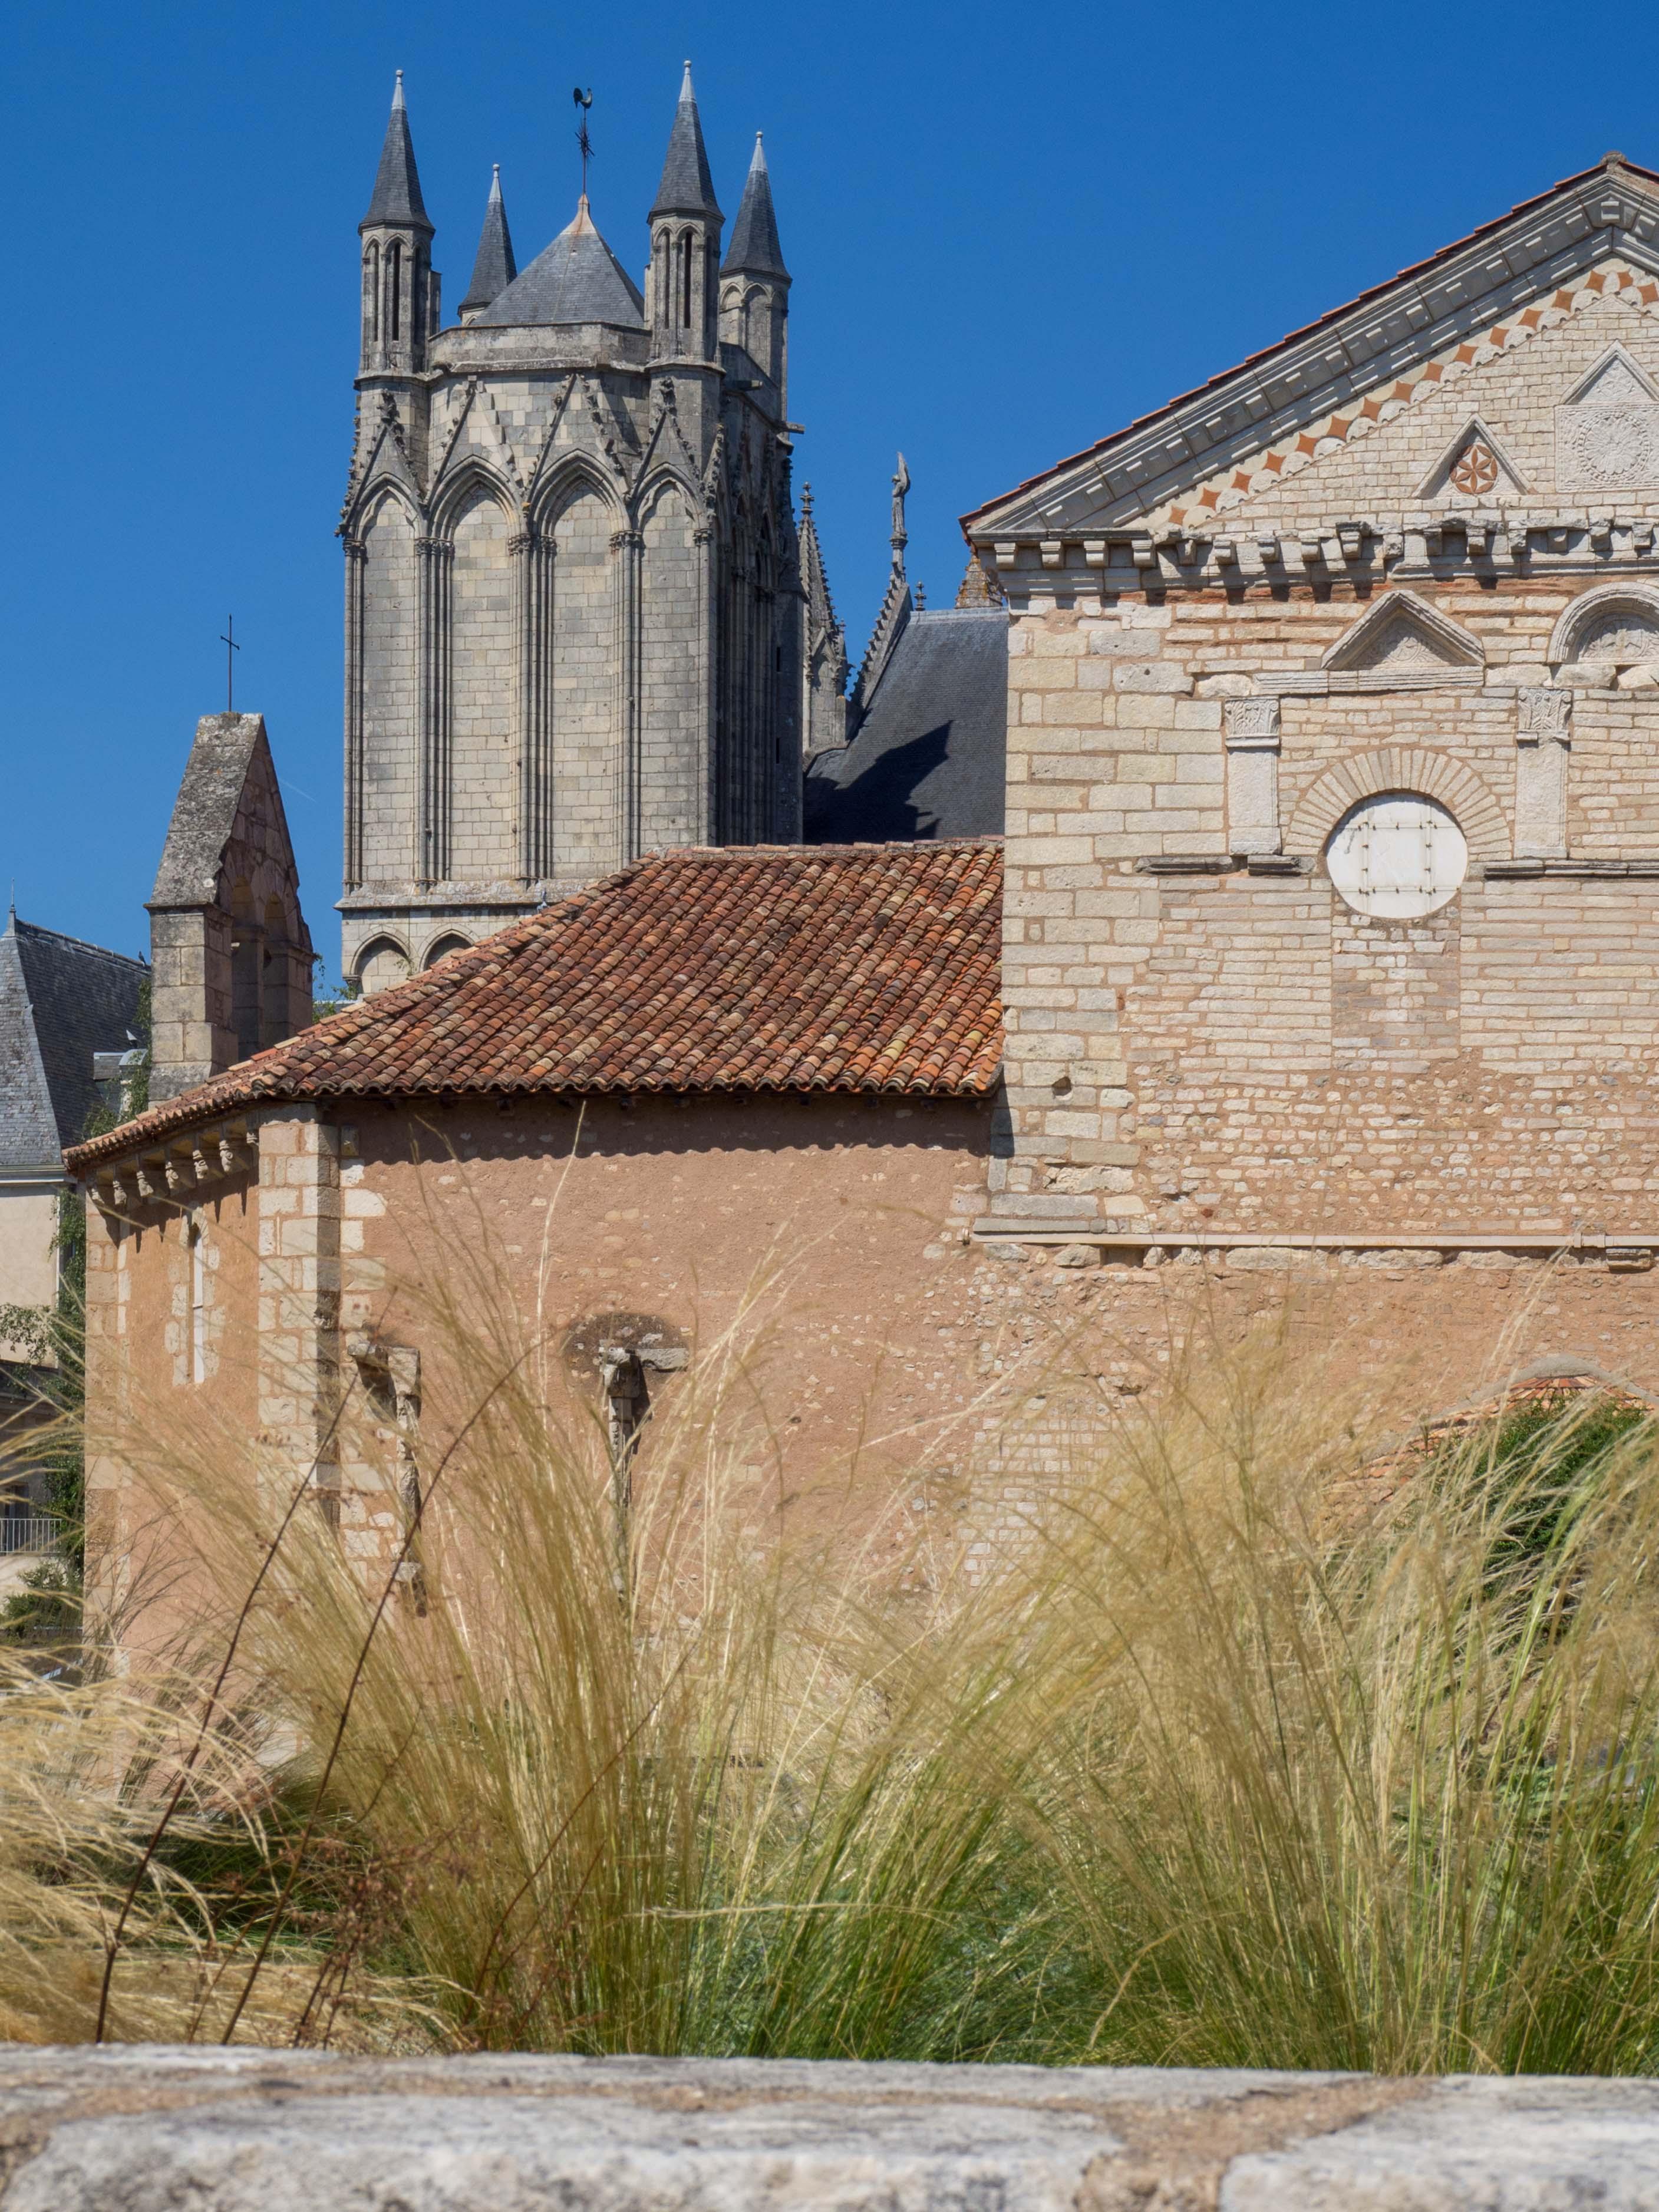 Un Jour de Neige - balade à Poitiers